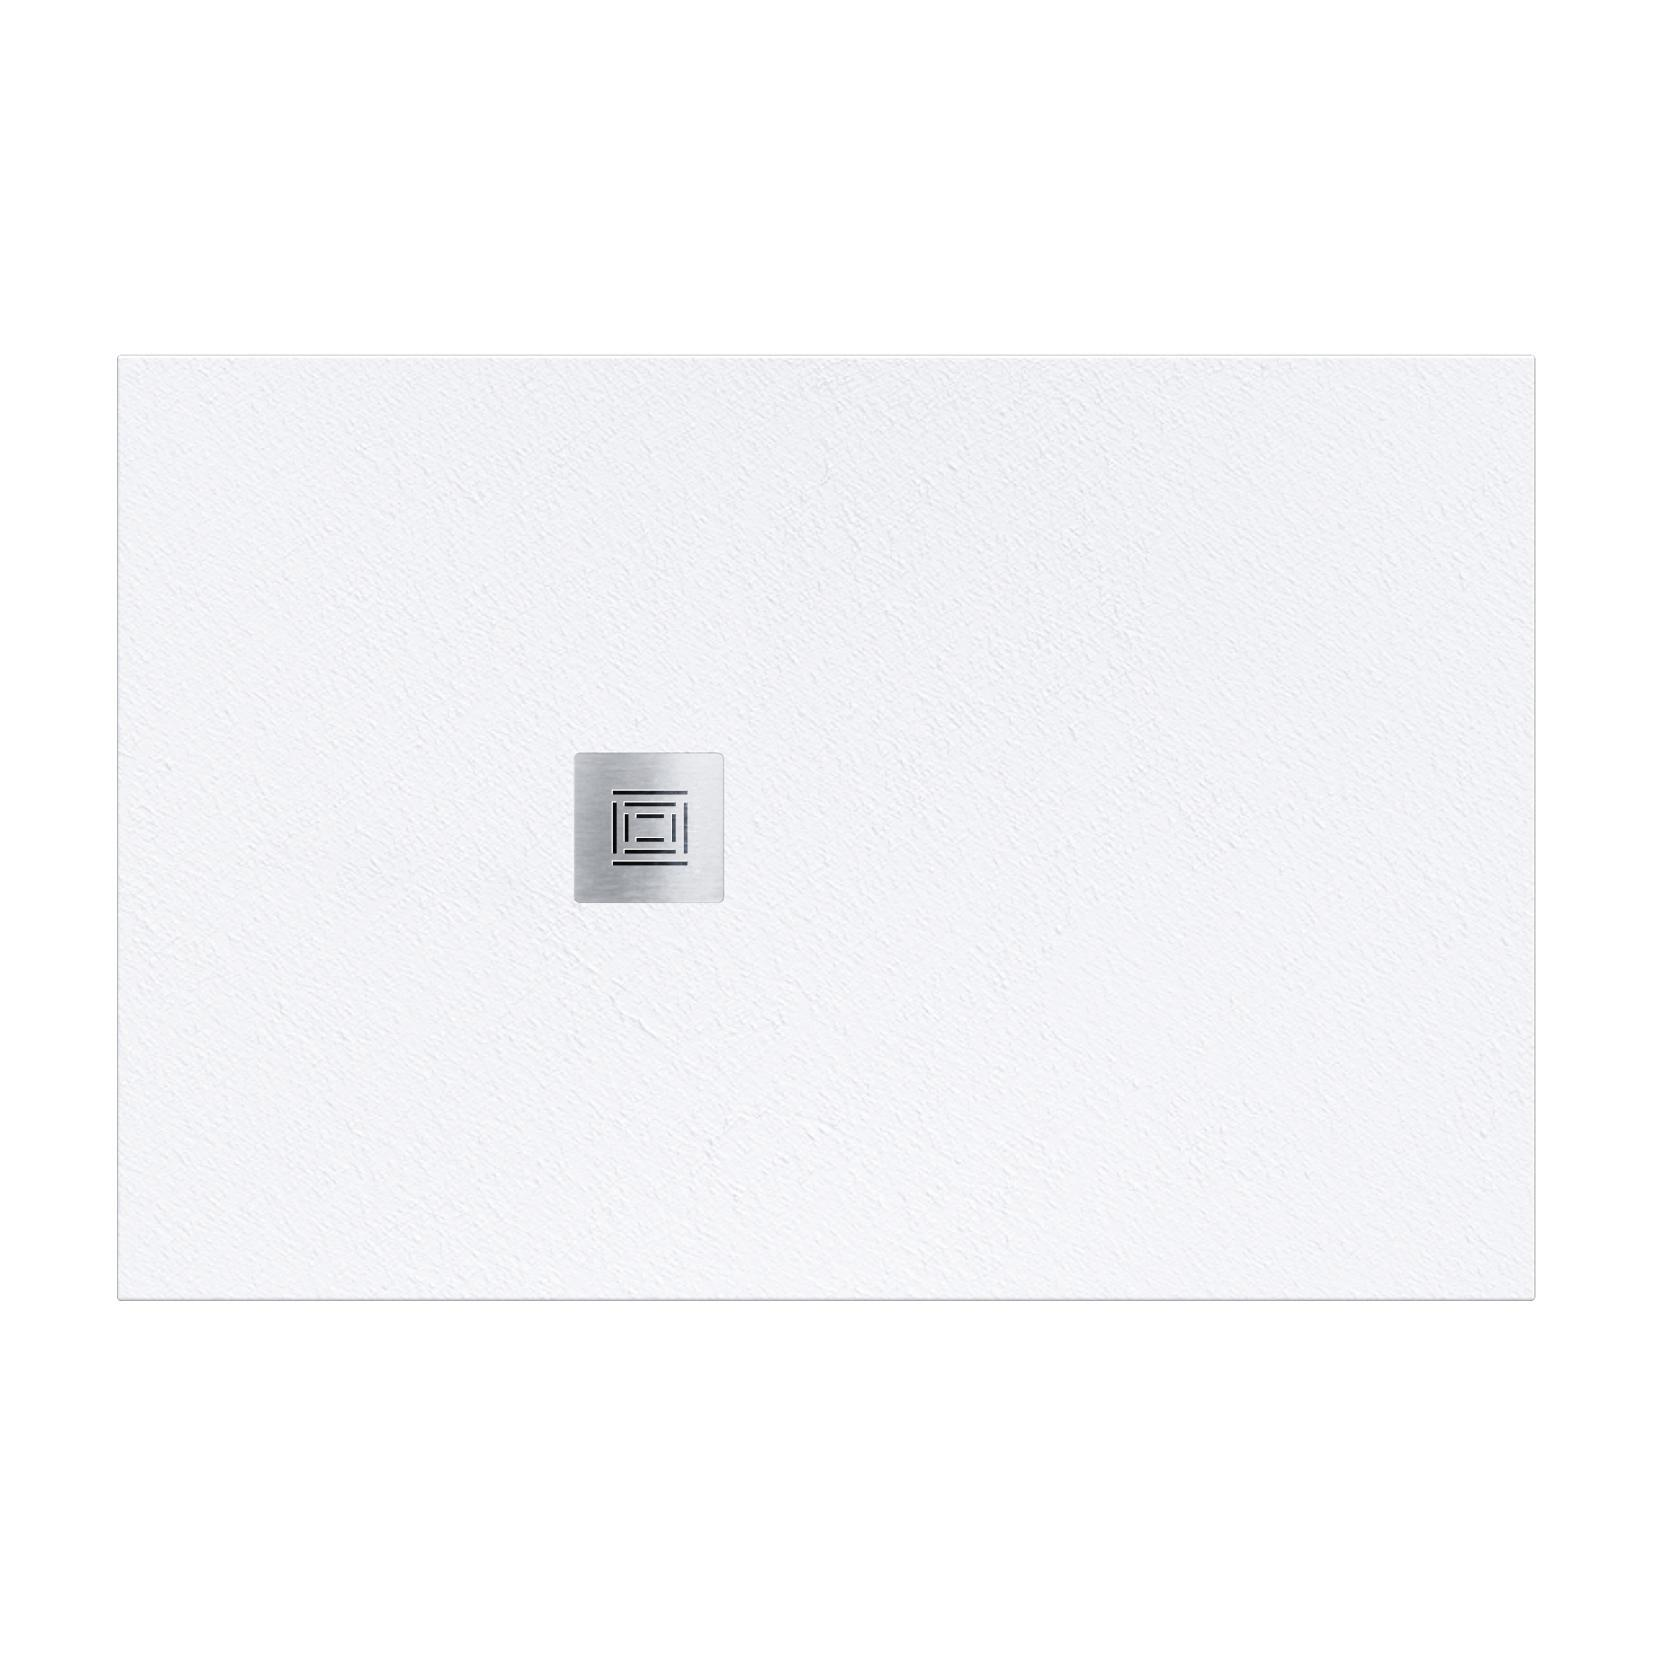 Piatto doccia resina Logic 70 x 120 cm bianco - 2